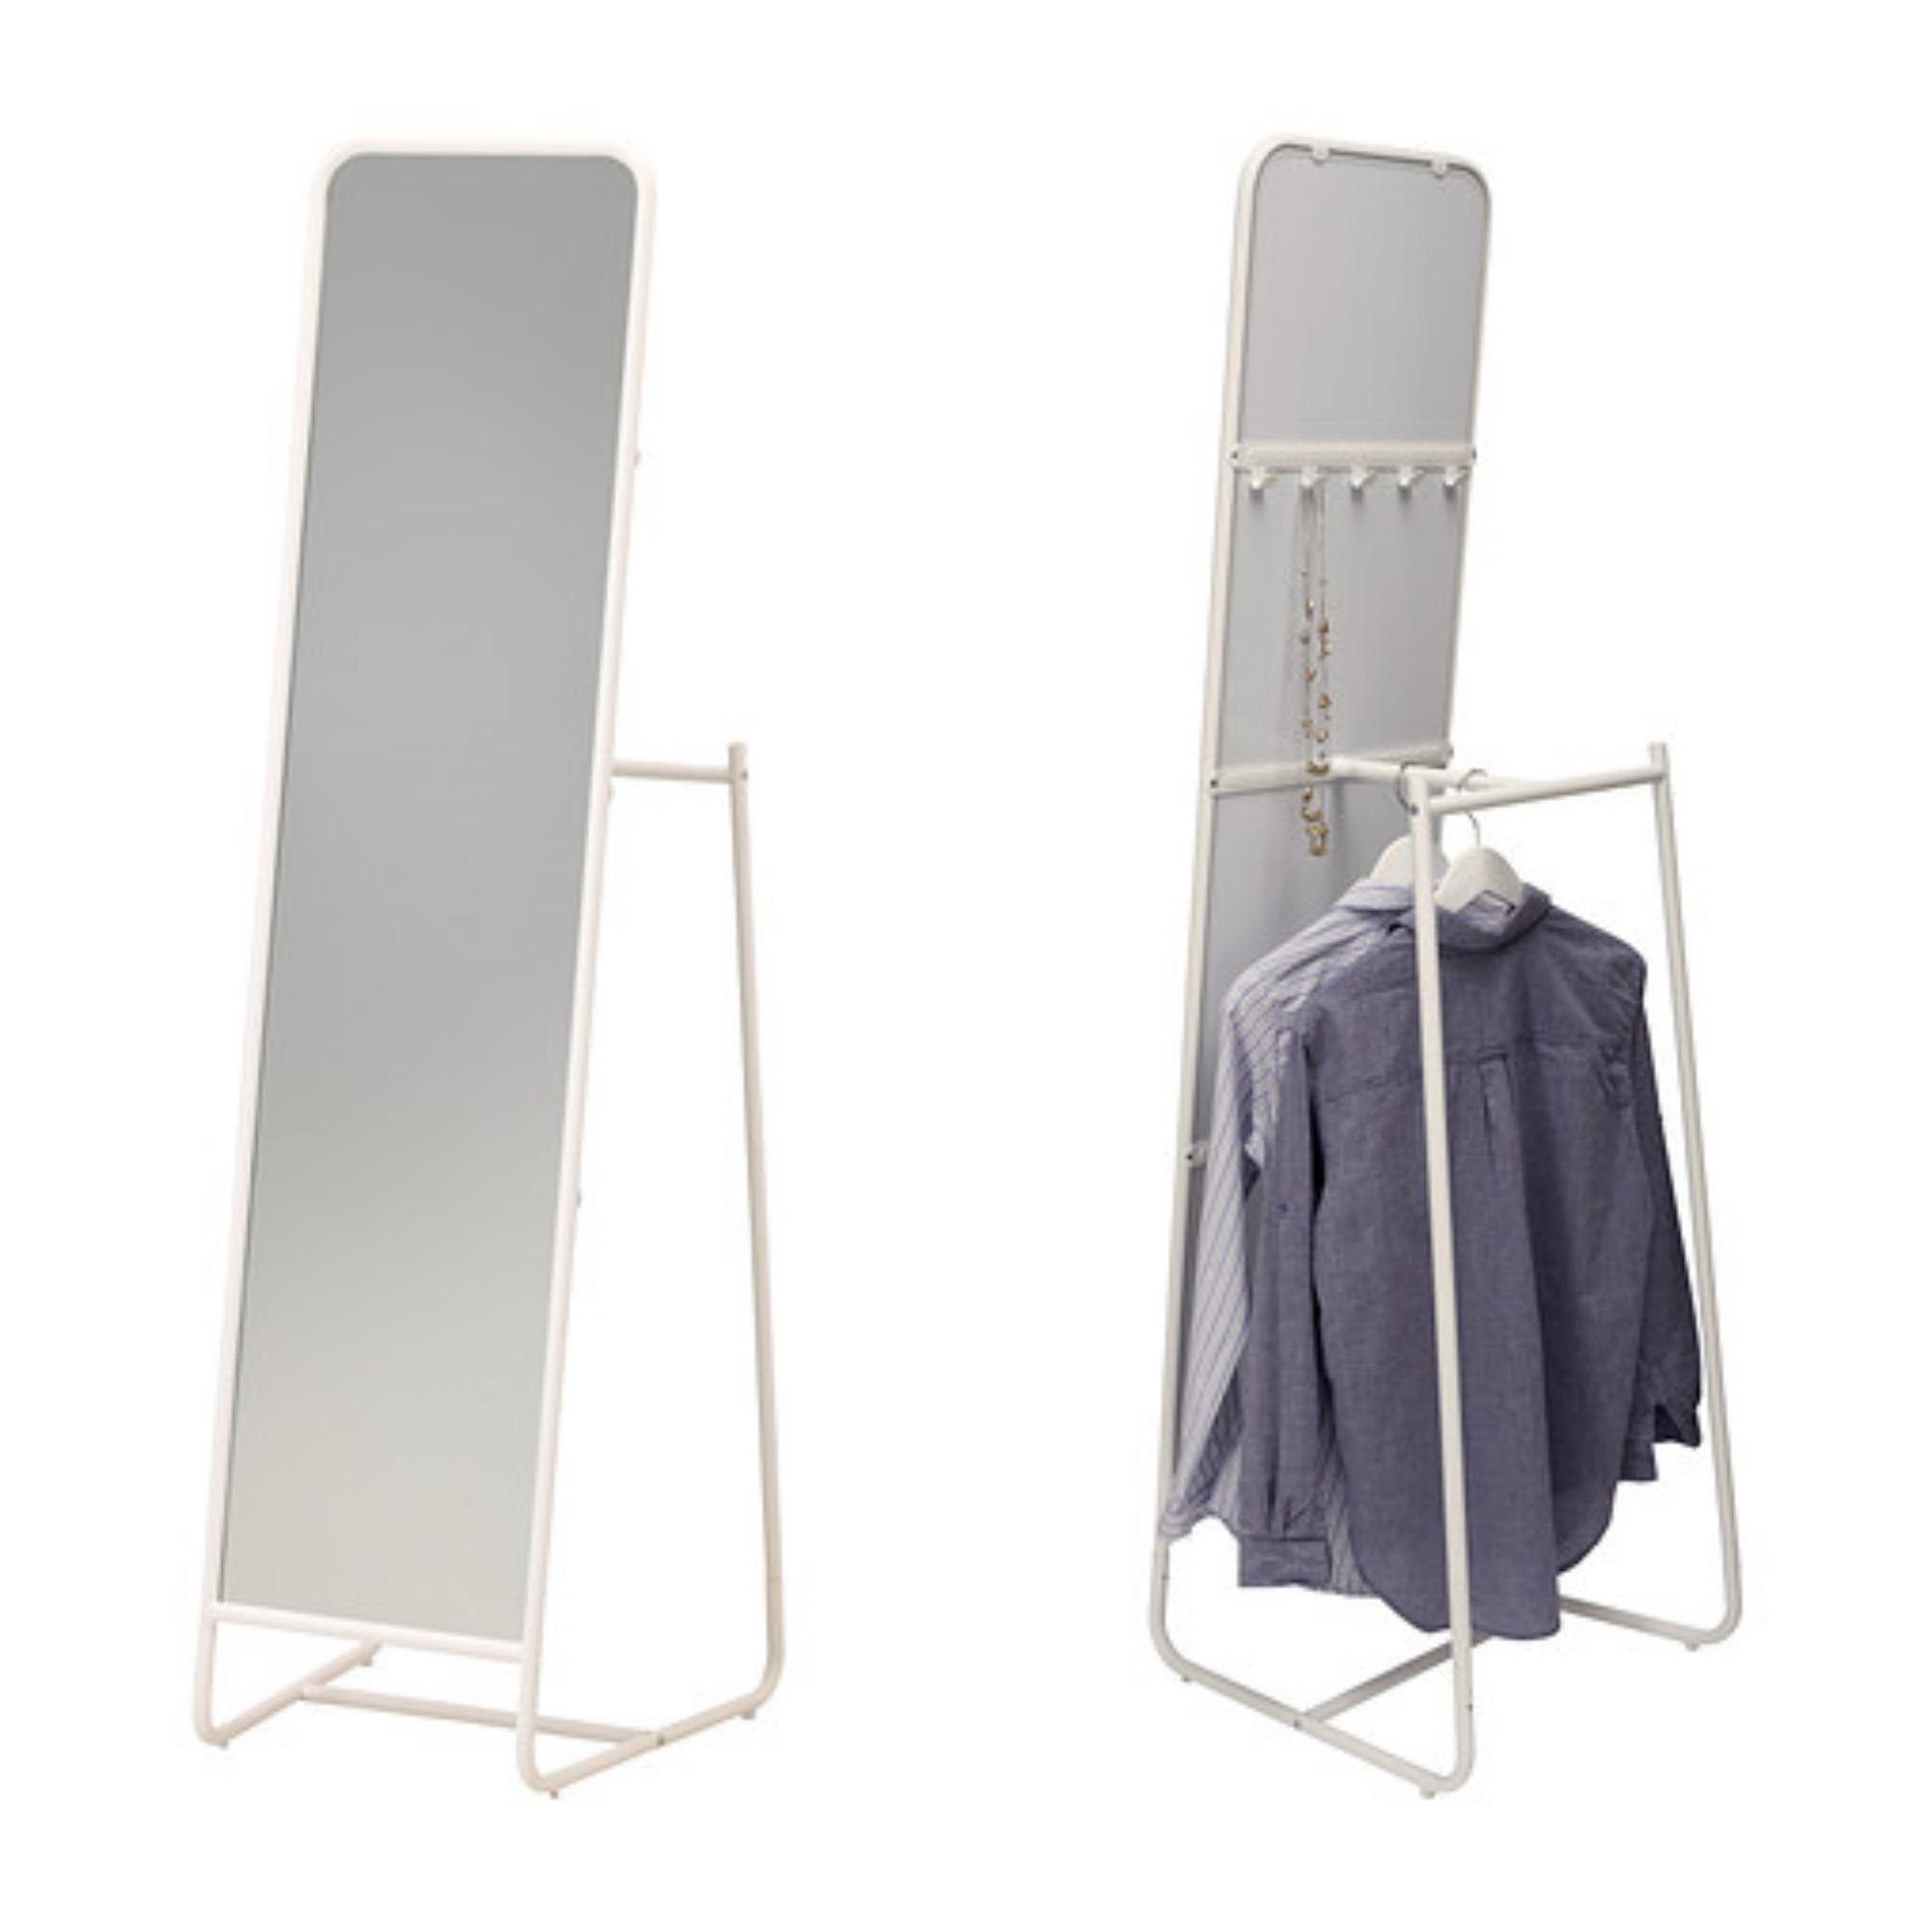 Mi nuevo espejo joyero y tienda vintage en gij n for Espejo cuerpo entero vintage